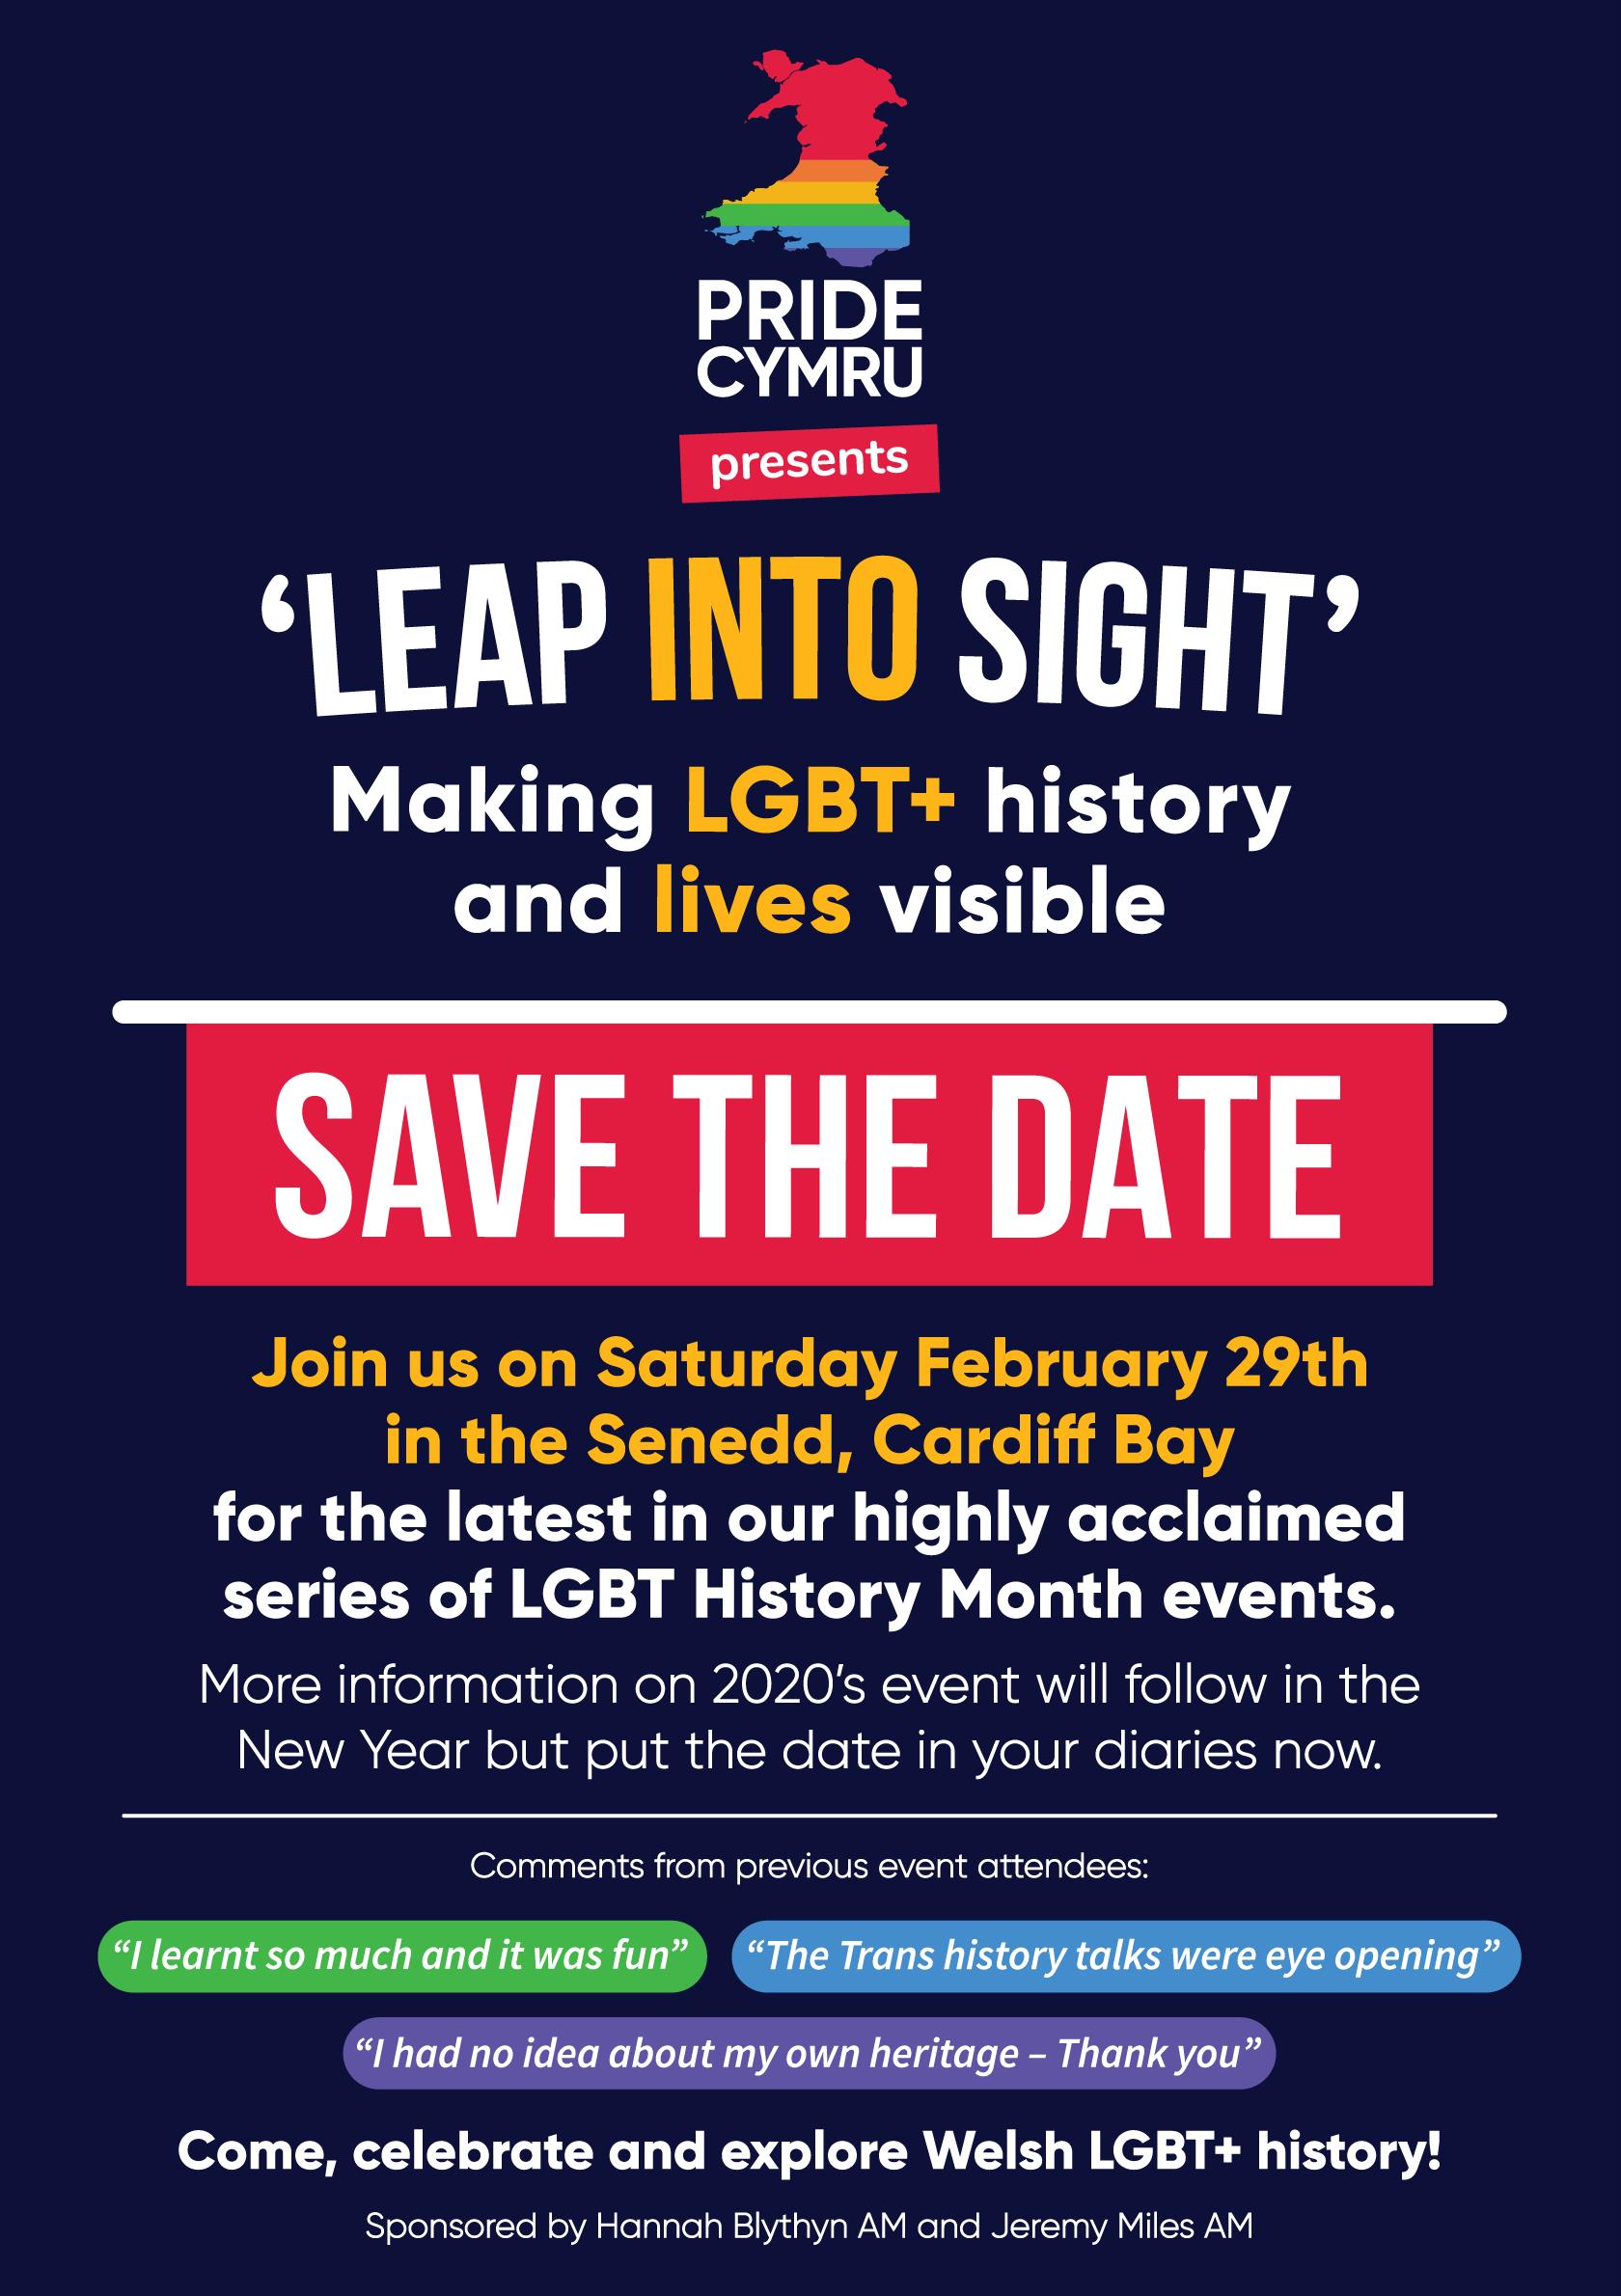 'Leap Into Sight' - Making LGBT+ history and lives visible